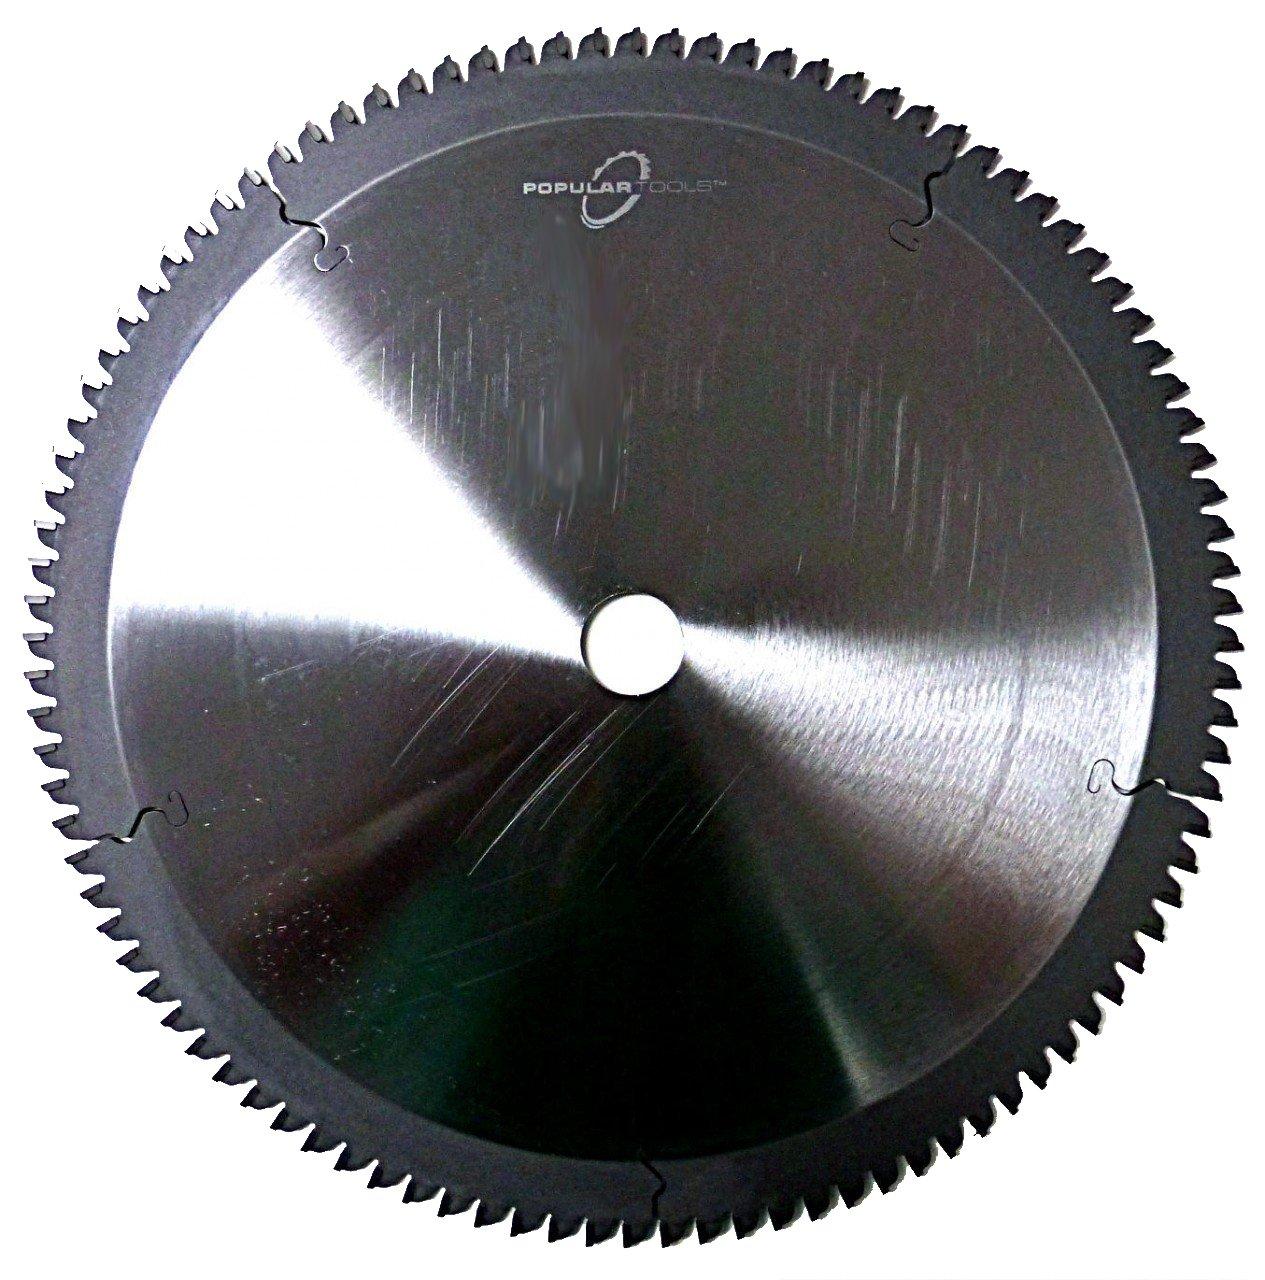 Popular Tools NF3503284 Non-Ferrous Cutting Saw, 350 mm Diameter, 84T Teeth. 2.5 mm Plate, 32 mm Bore